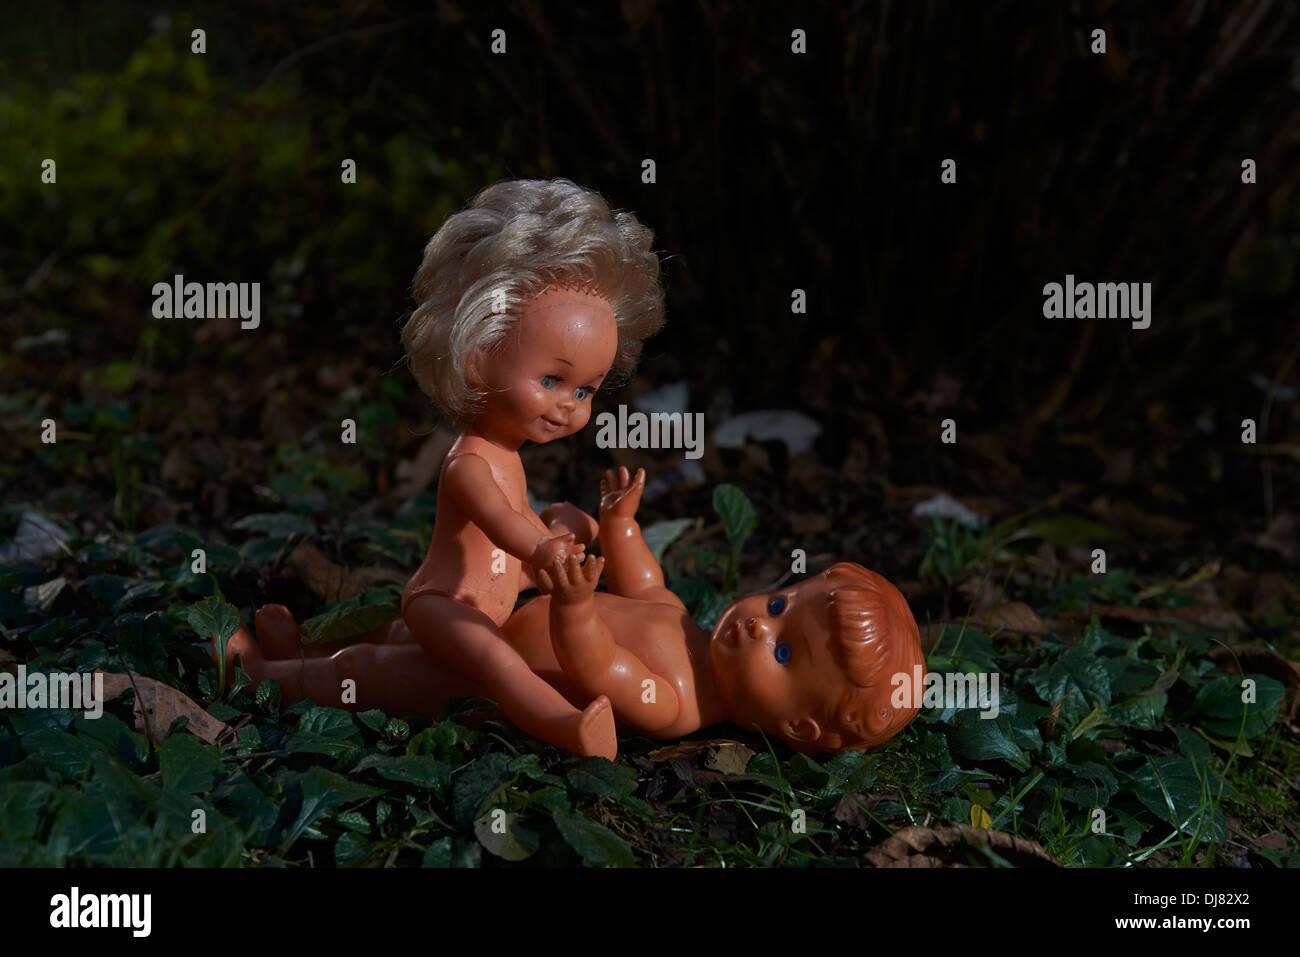 Junge Babys haben Sex